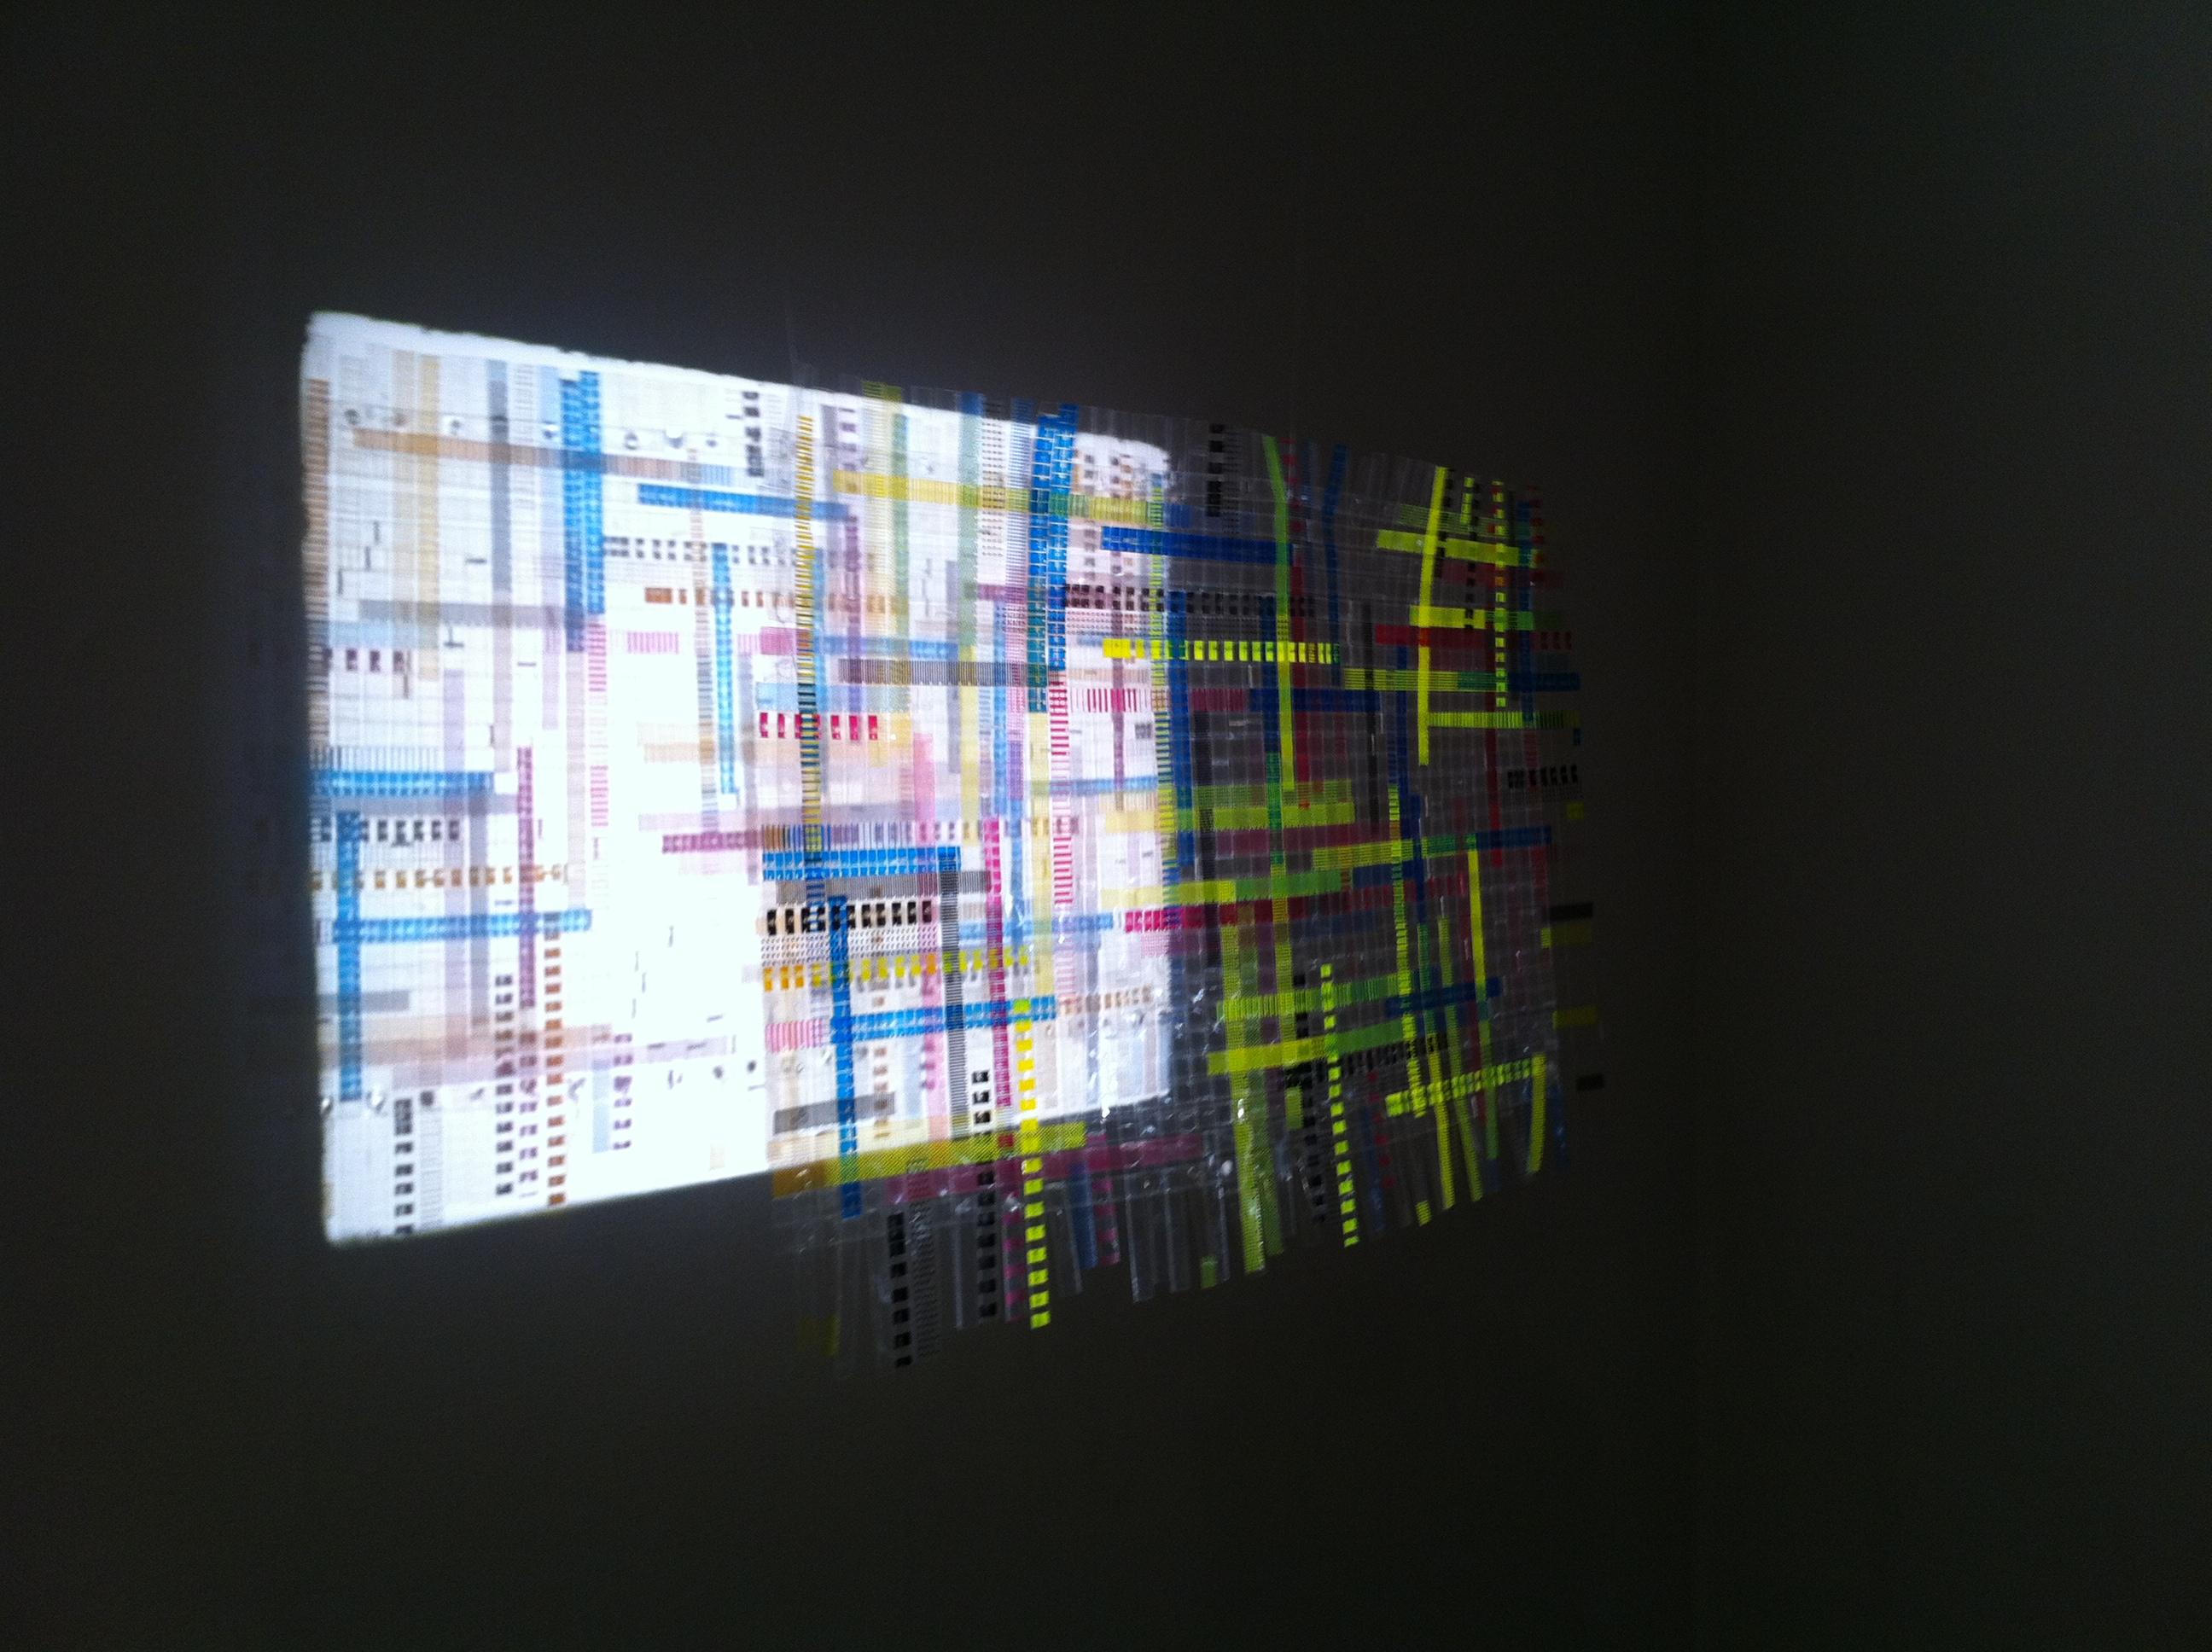 Photo Umkc Gallery Of Art